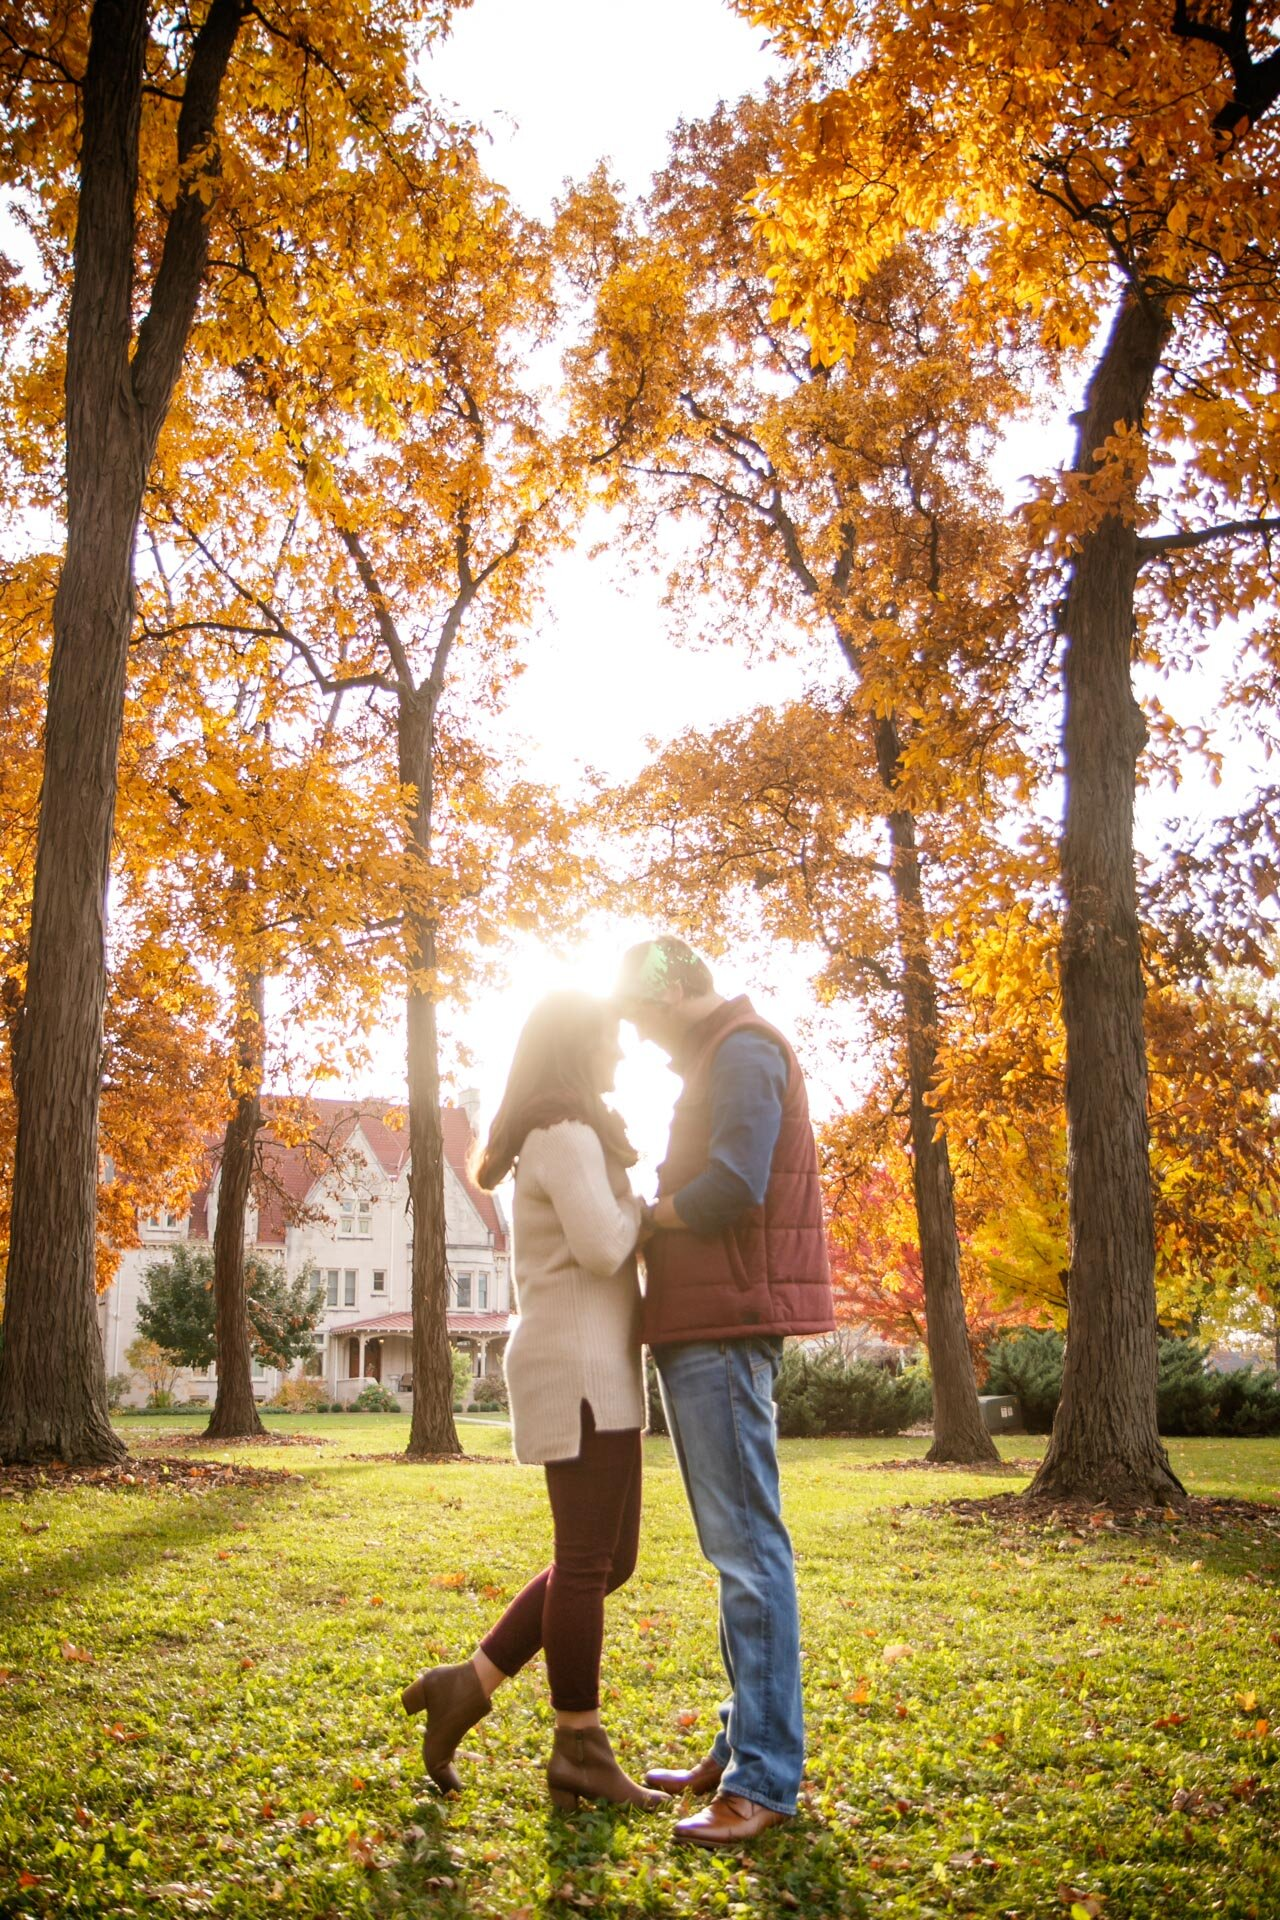 autumn-lighting-afternoon-colors-adam-shea-photography-green-bay-wisconsin-neenah-adam-shea-photography-green-bay-appleton-neenah-photographer-06.jpg